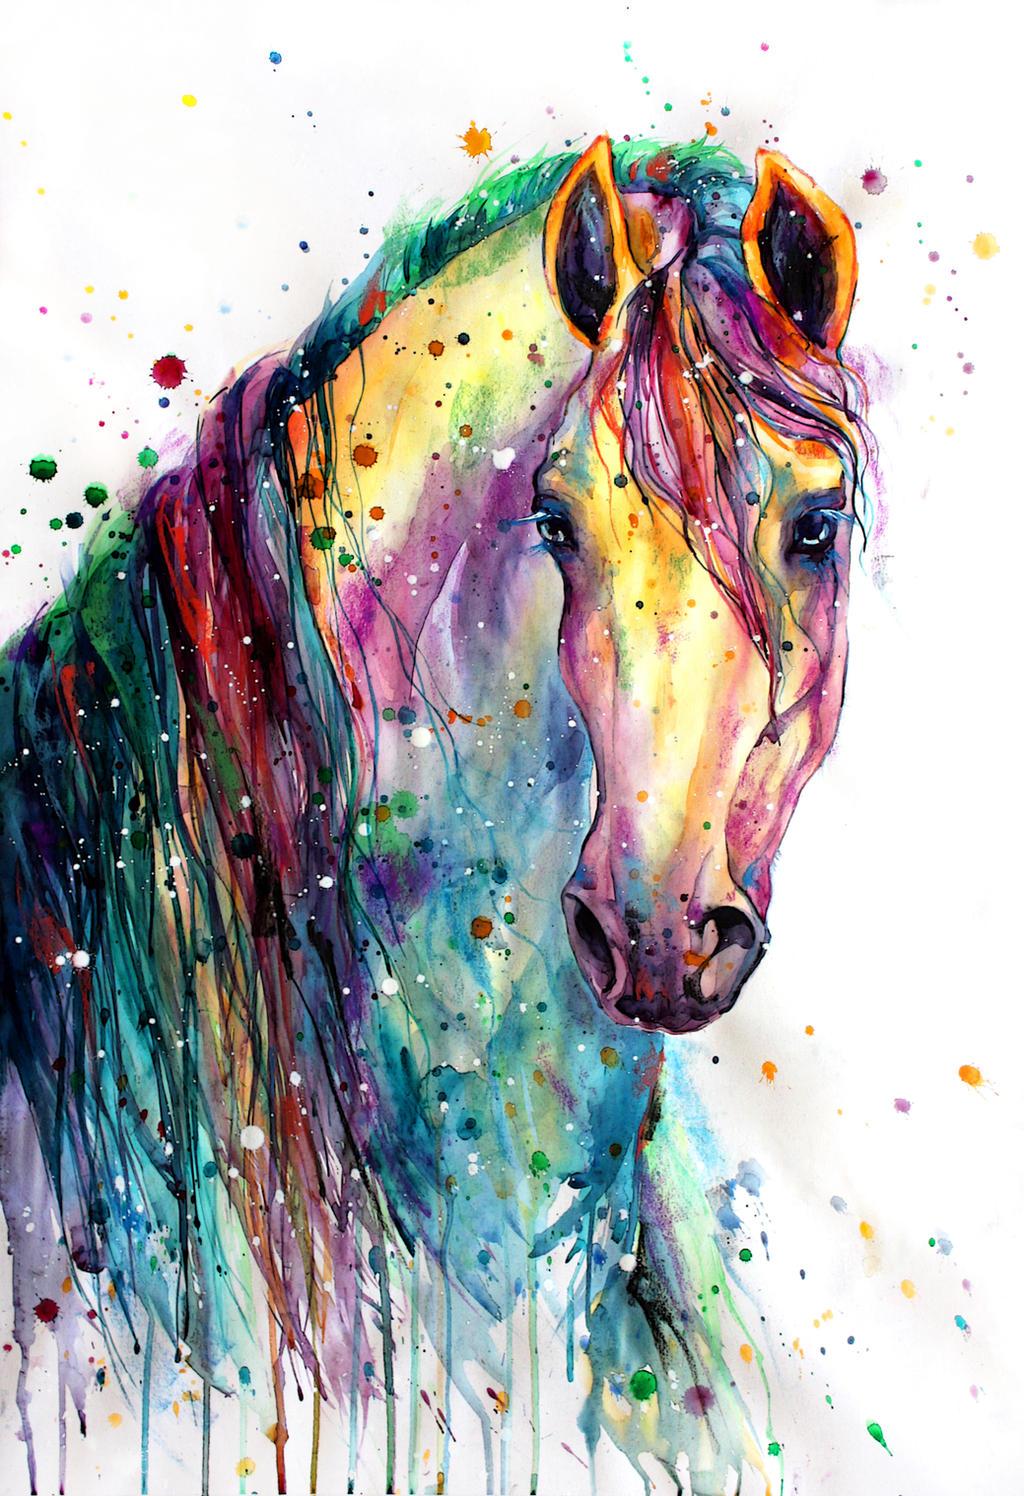 rainbow horsey2 by elenashved on deviantart